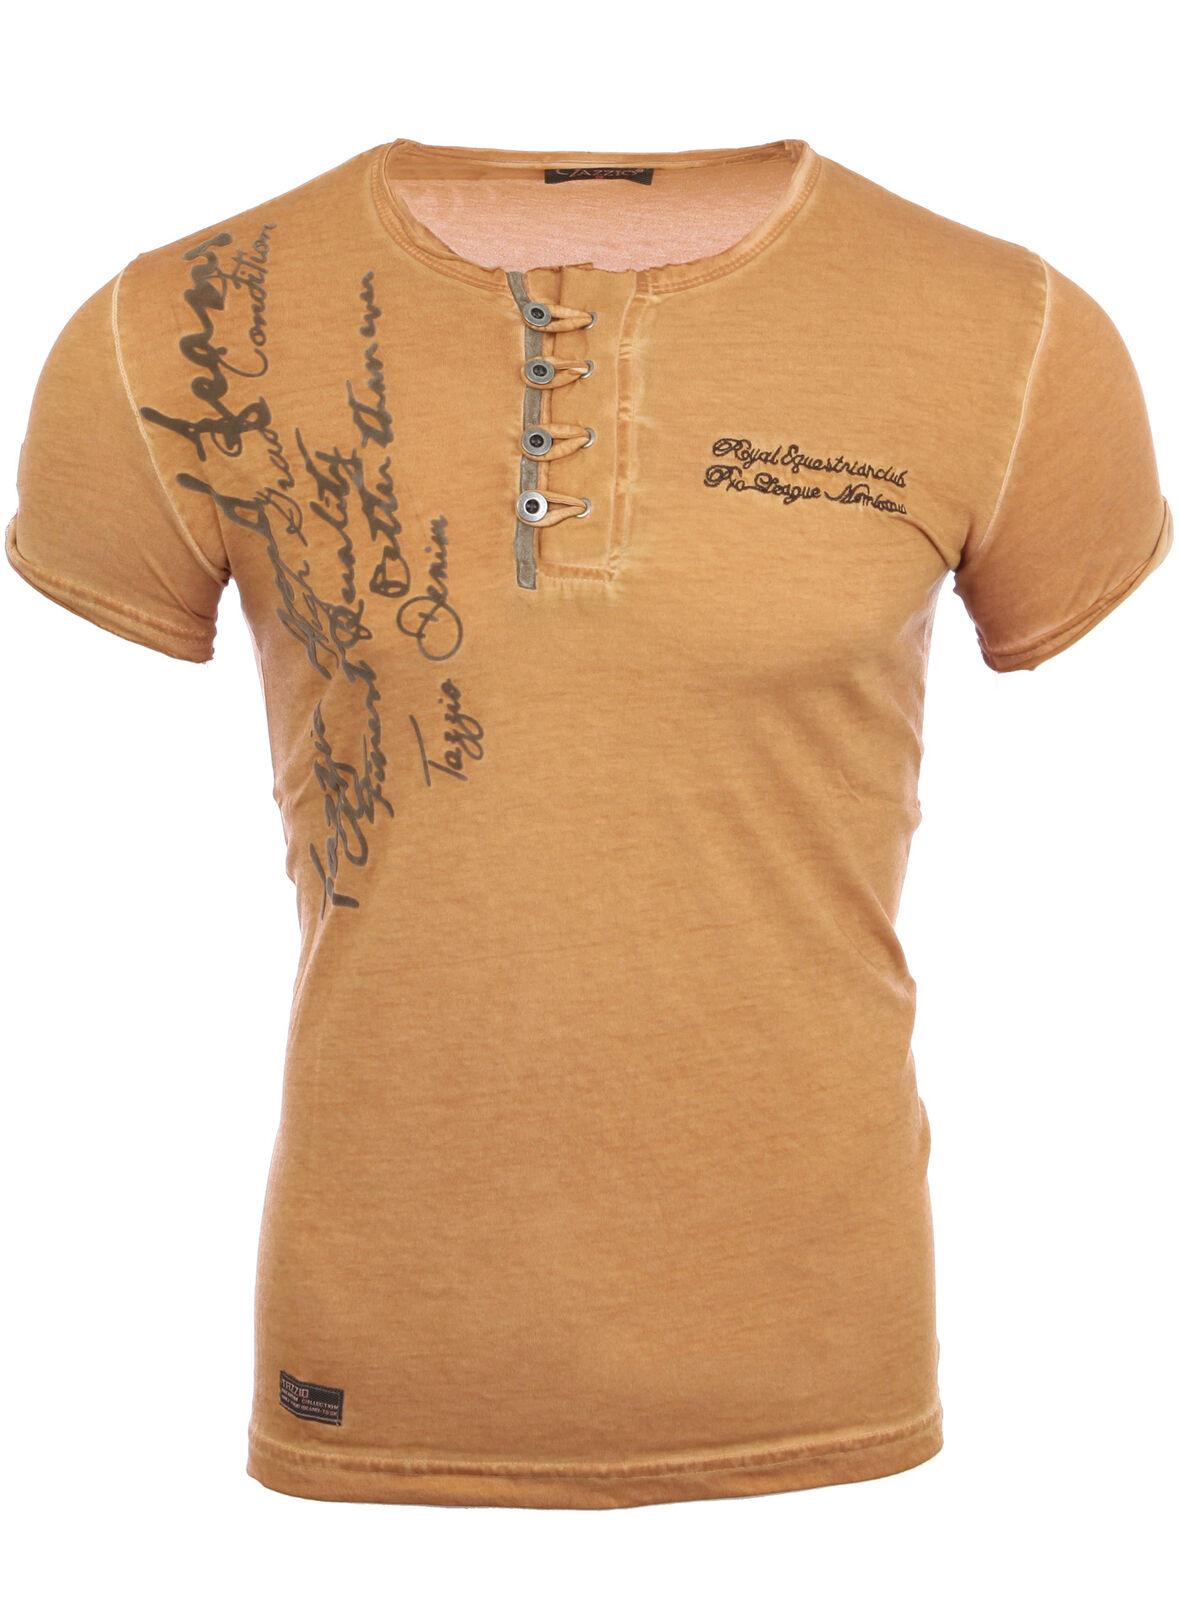 71b8391e557236 Reslad Clubwear 4050 Herren Batik Style Vintage T-Shirt Poloshirt Hemd Neu